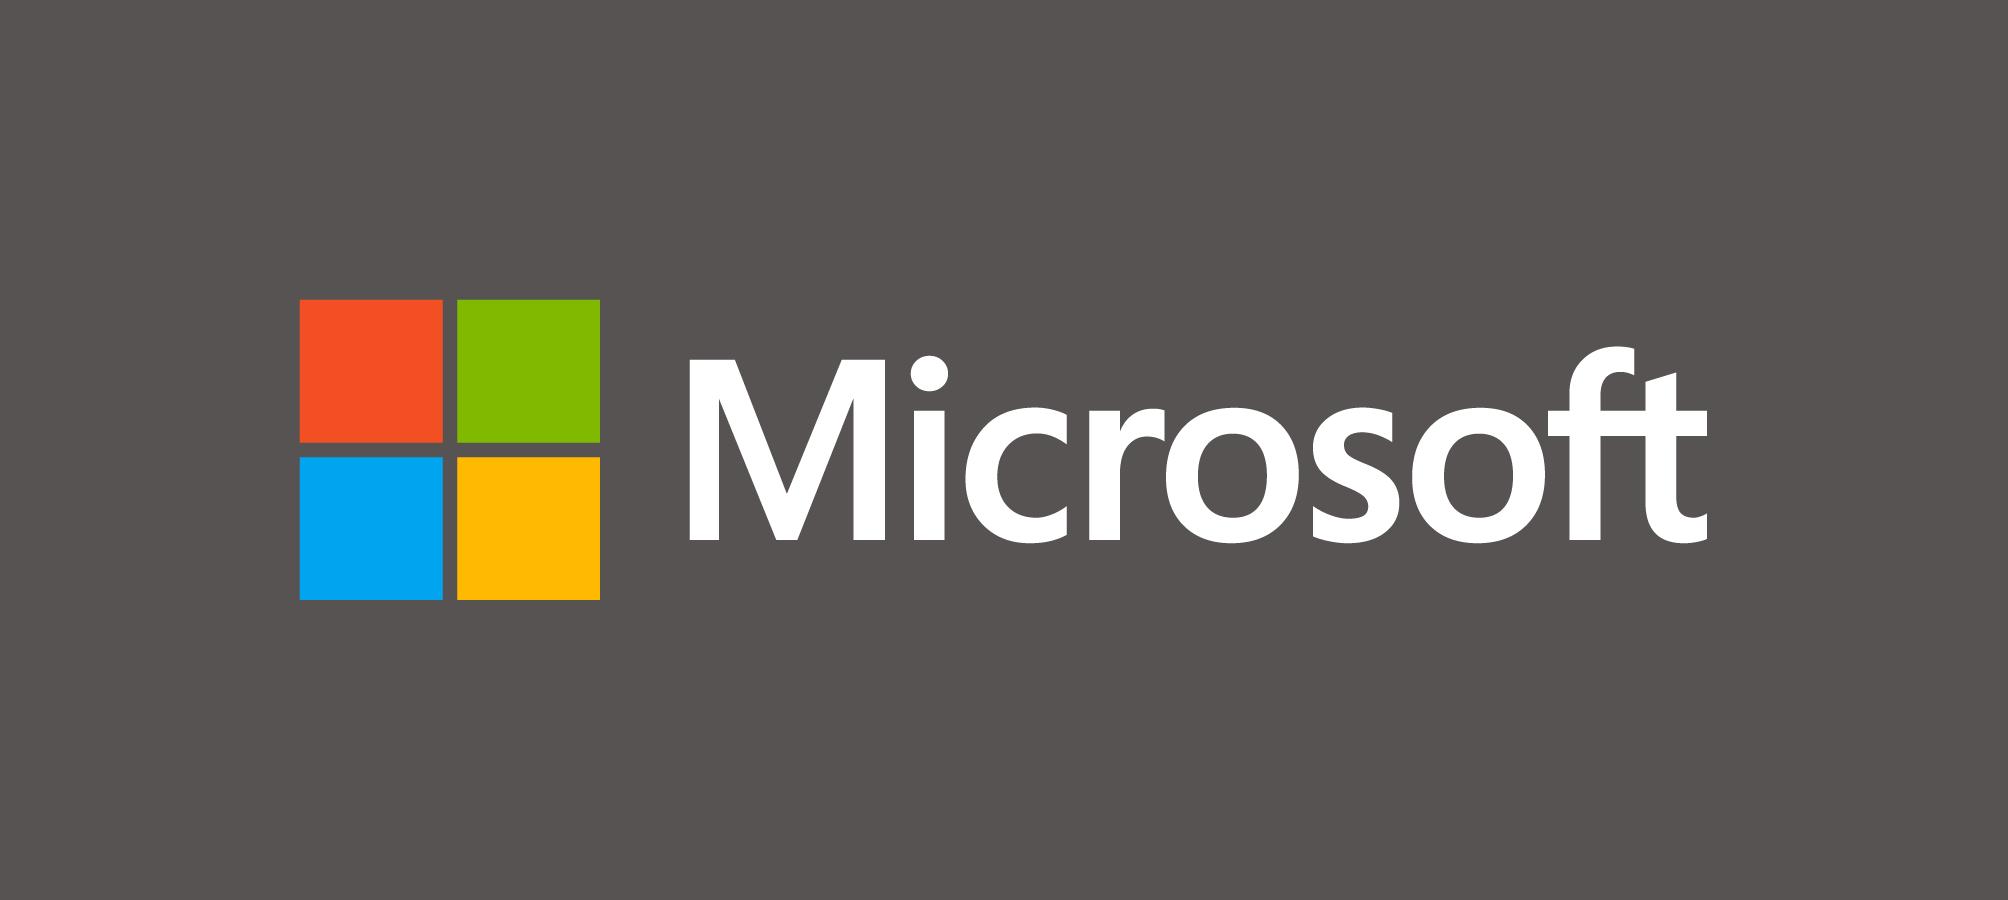 Liberar Microsoft Gratis – Desbloqueo Móvil Celular